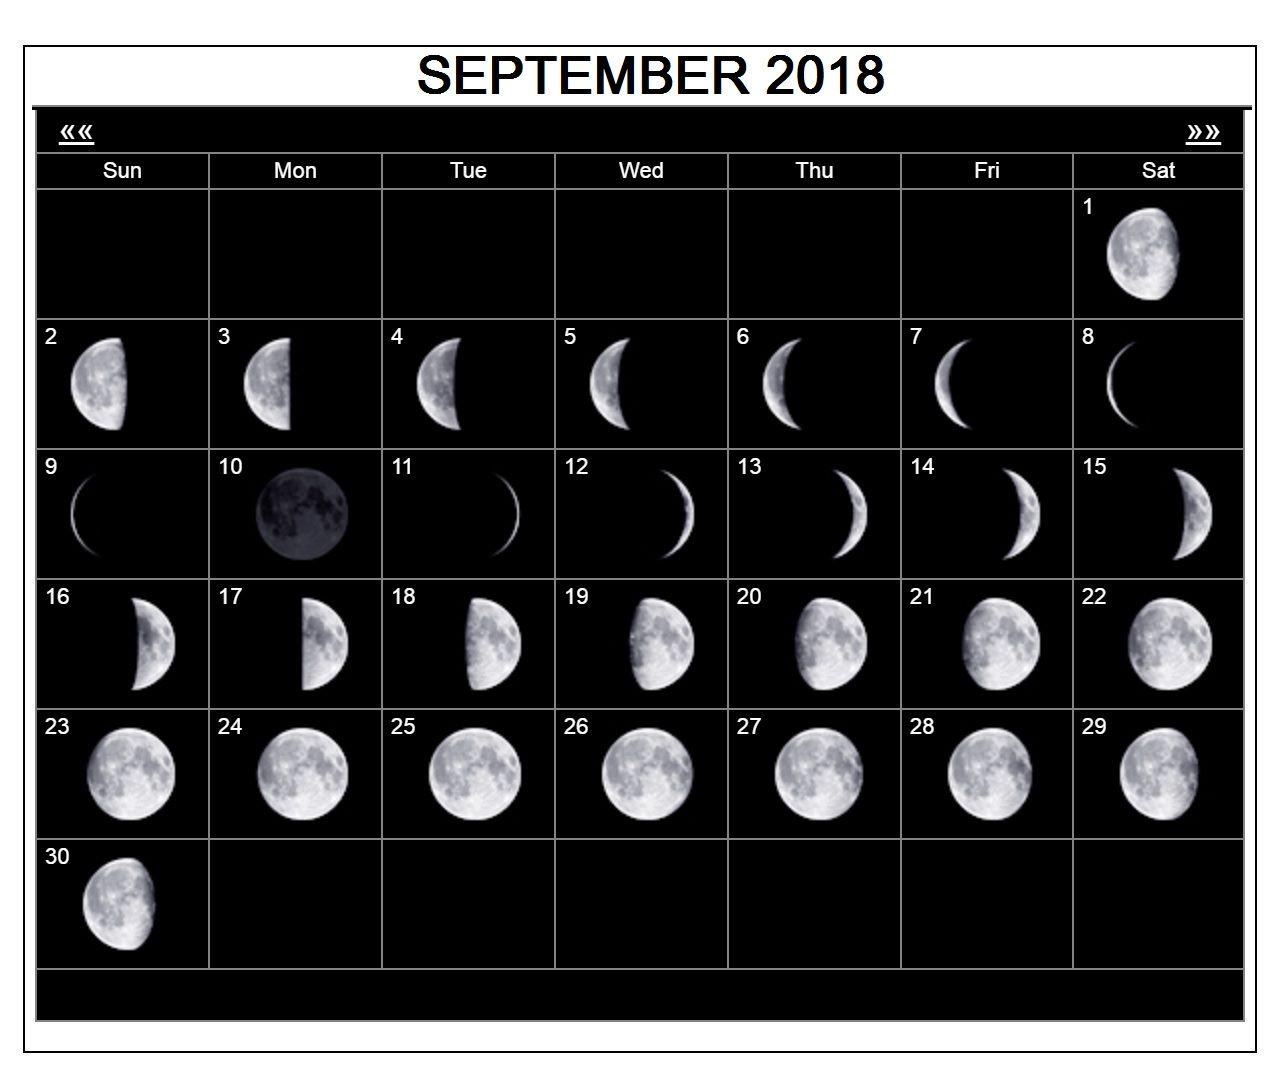 September 2018 Calendar Moon Phases Moon Phase Calendar Moon